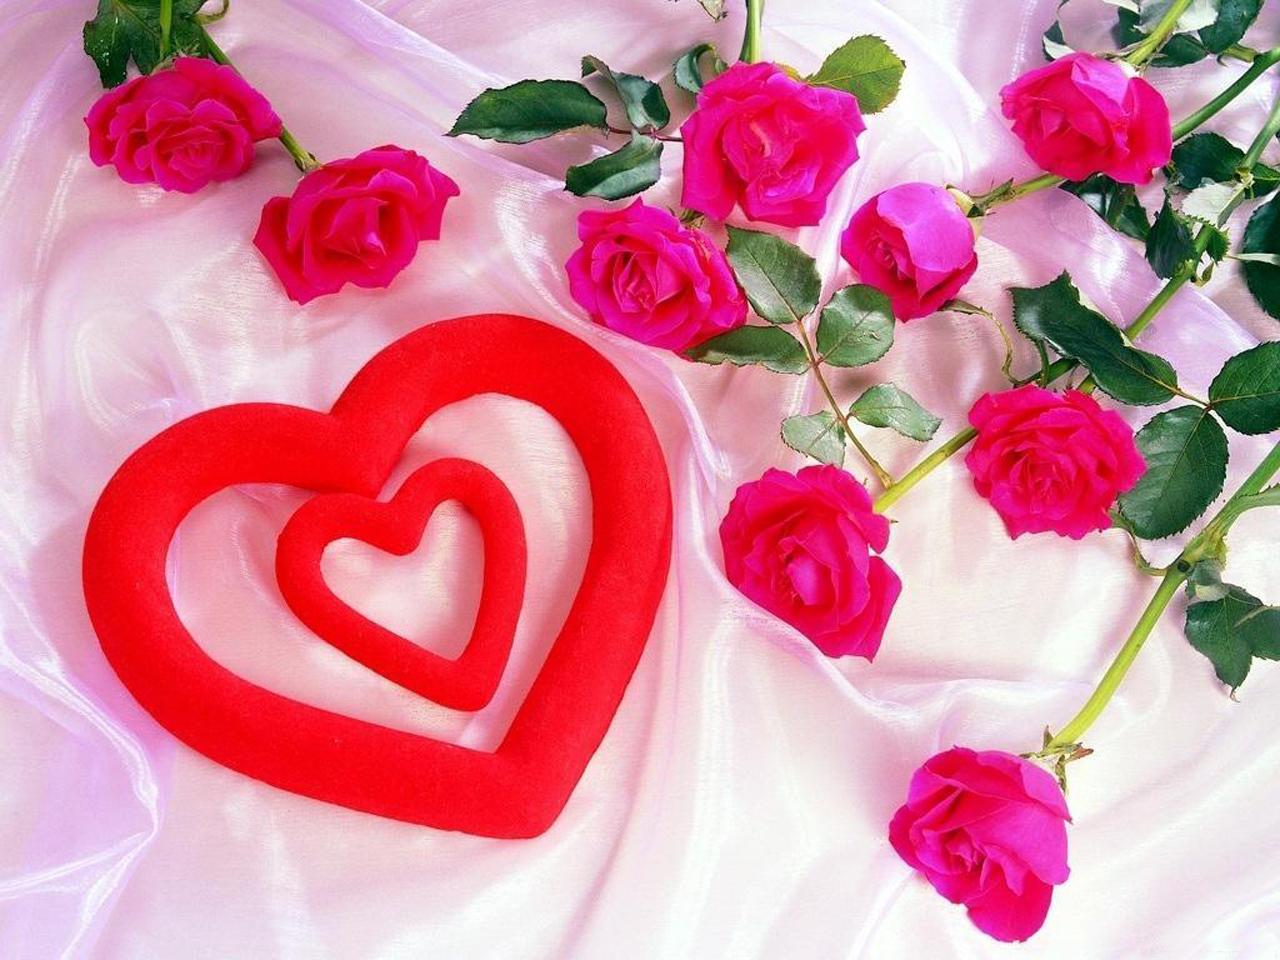 http://2.bp.blogspot.com/-VFbza6QojLI/T6EFKEyGULI/AAAAAAAAAaY/rM4mBx_k0gw/s1600/Silky+Sweet+Heart.jpg